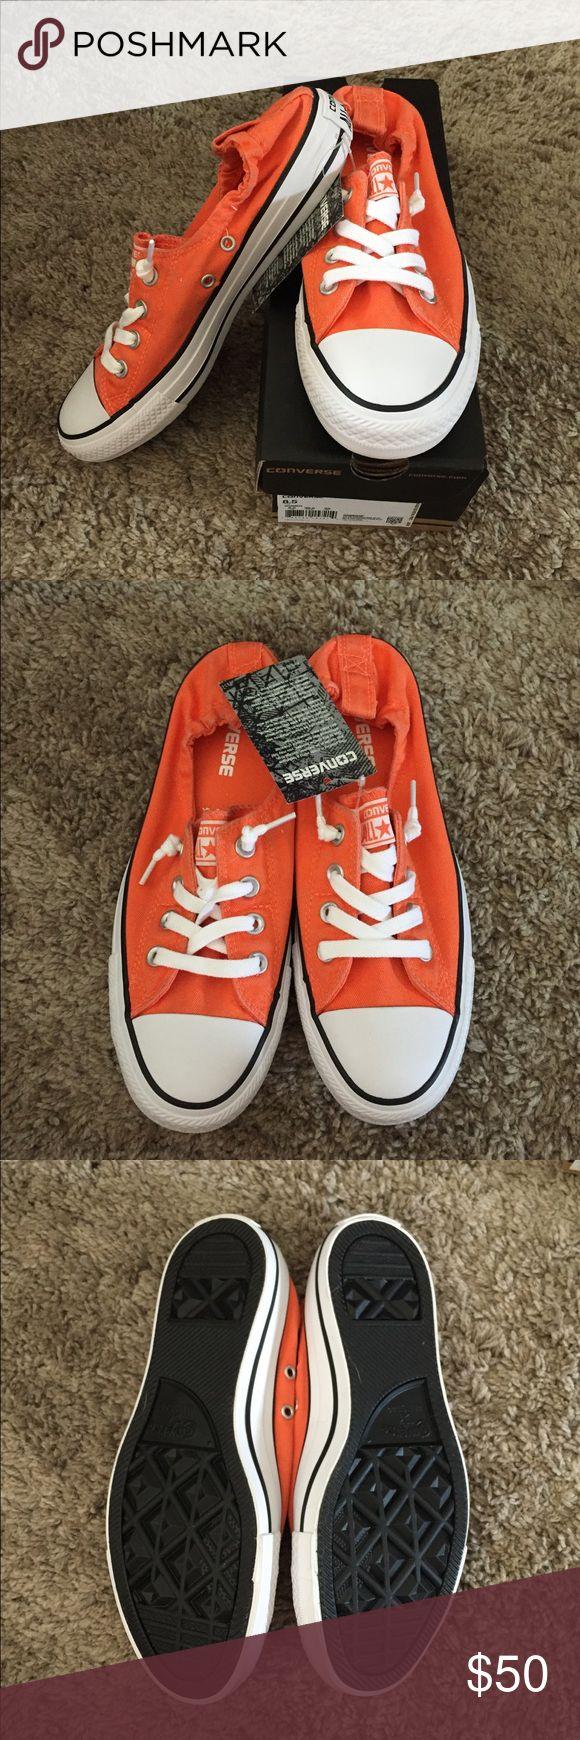 Orange Converse Shoreline New with box! Orange and white converse. Shoreline style, size 8.5 Converse Shoes Sneakers